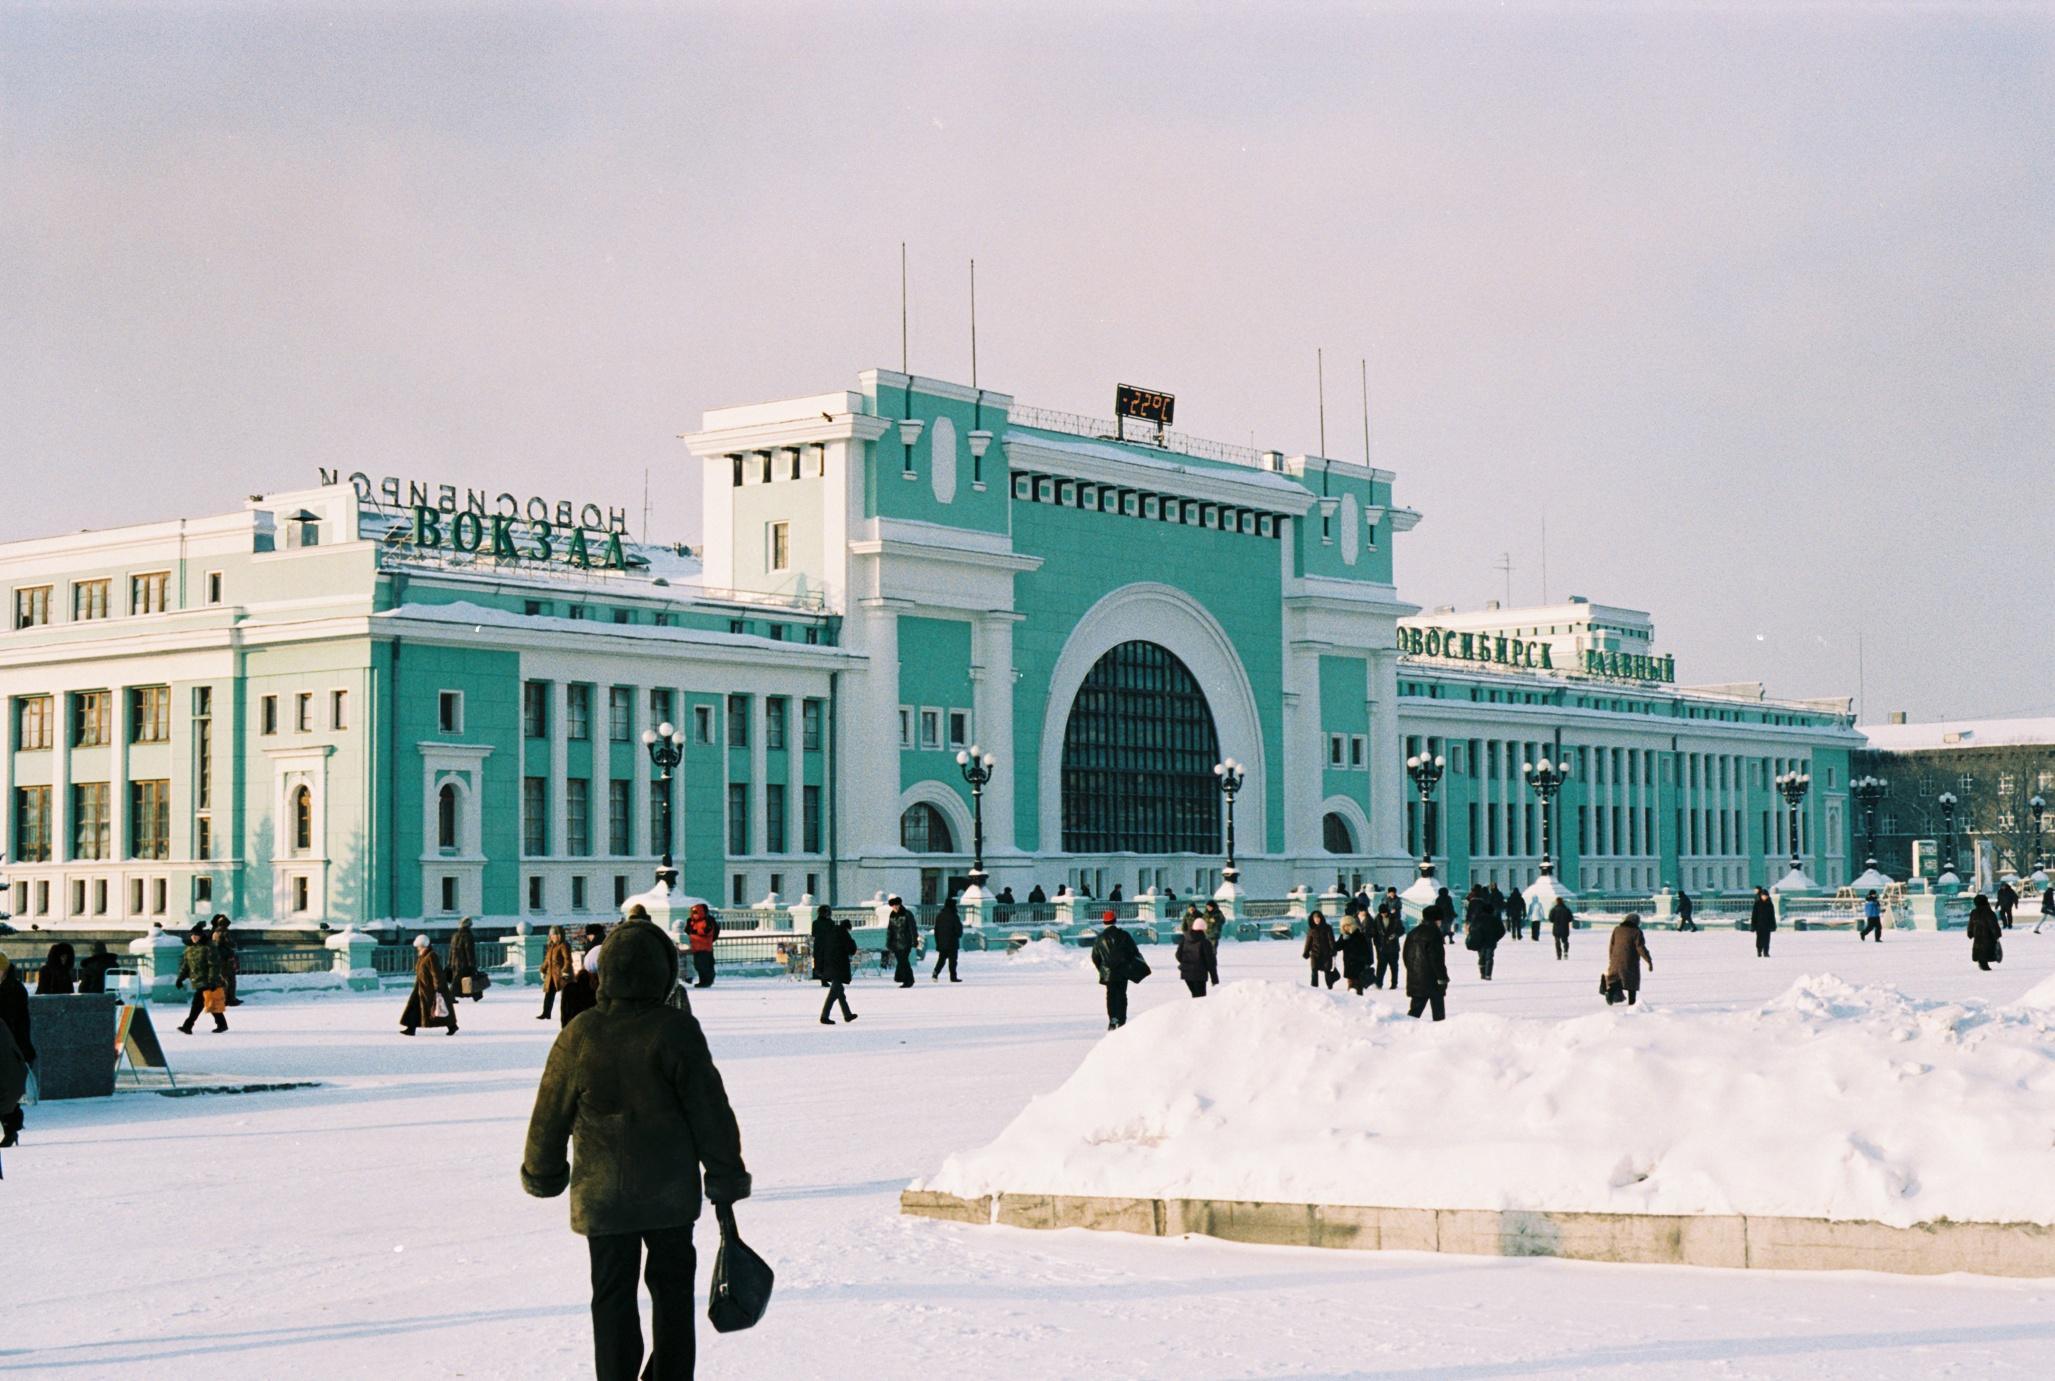 Description railway station of novosibirsk